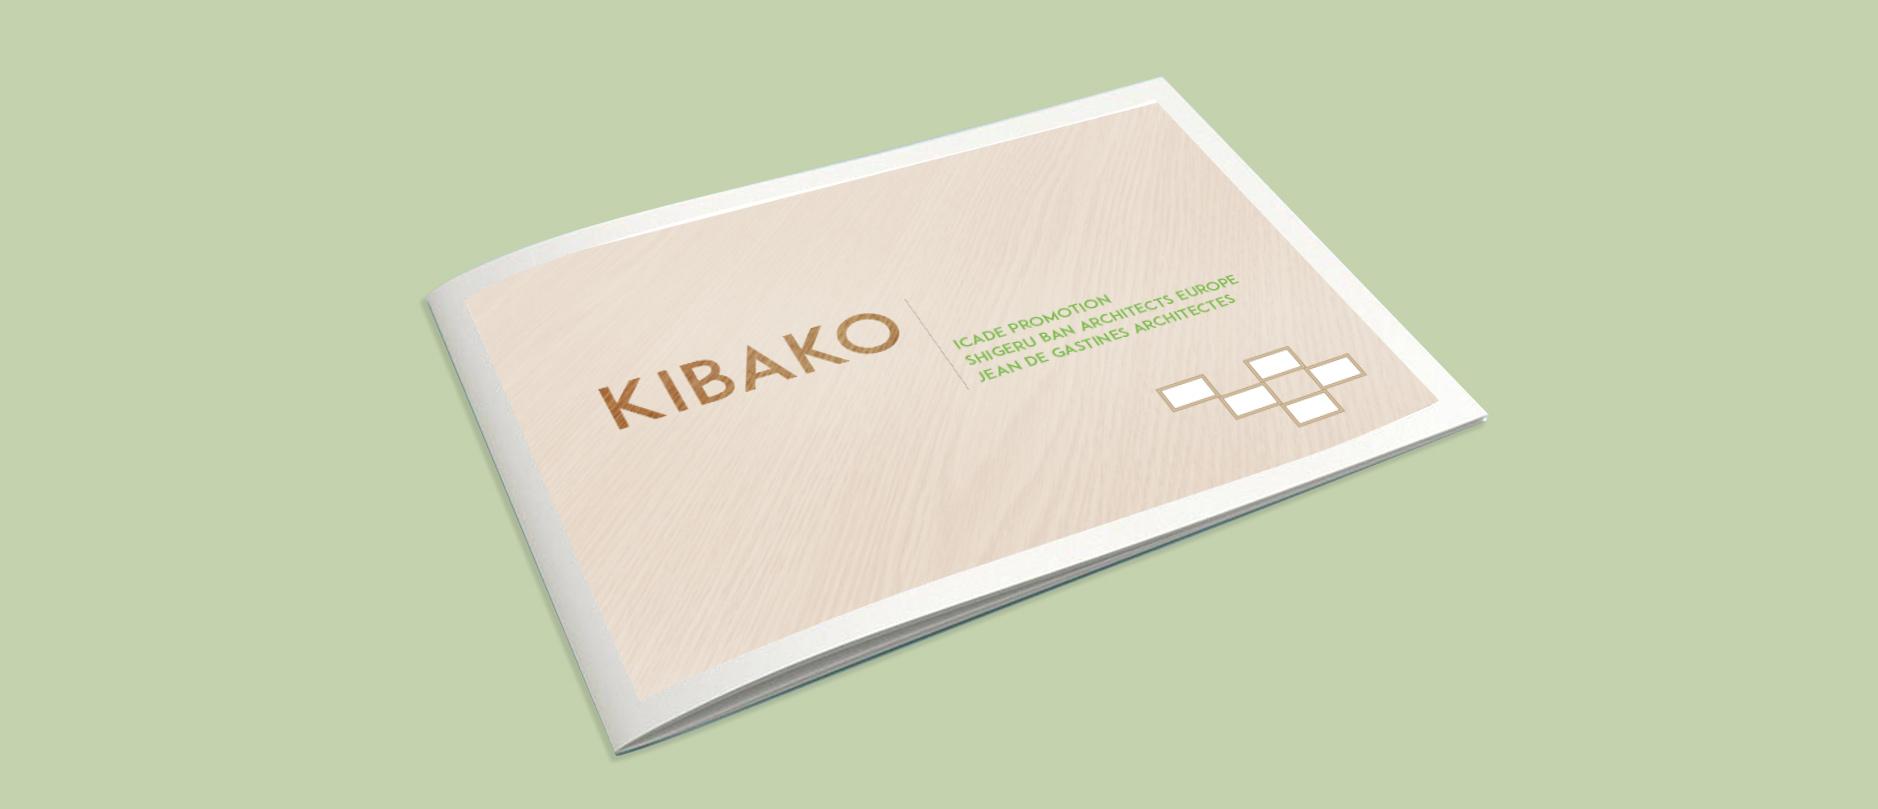 Icade Kibako 1